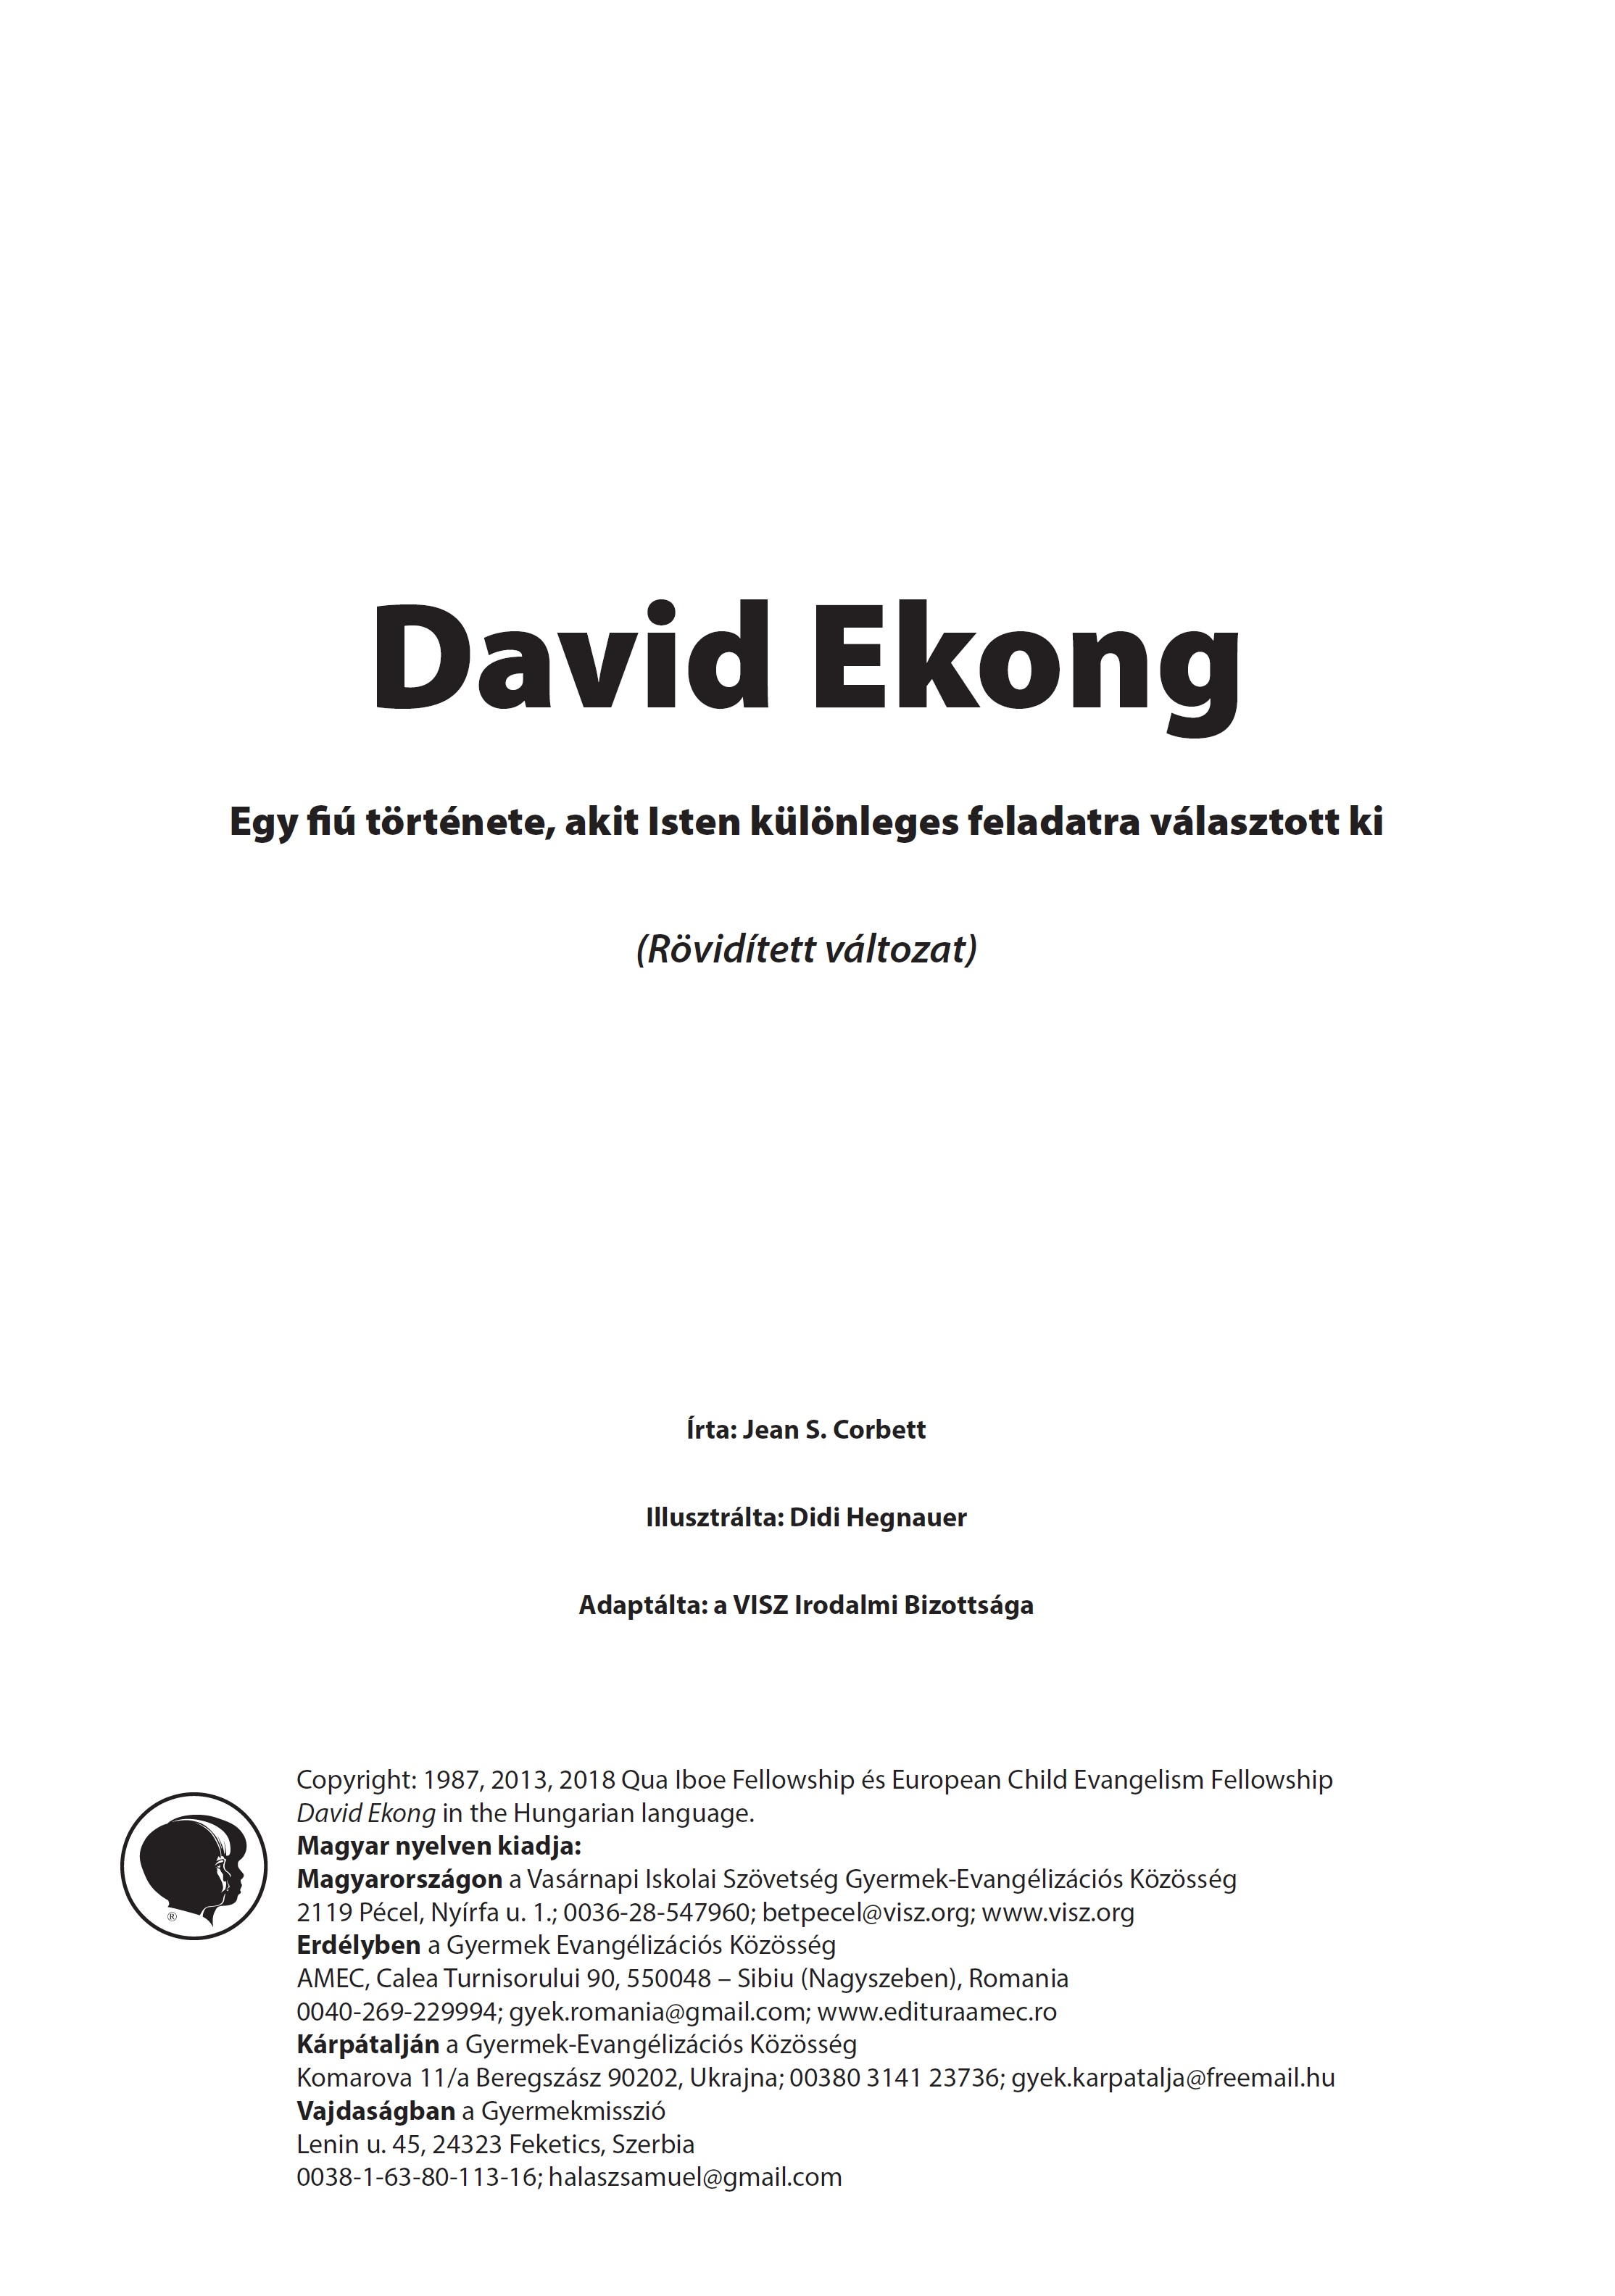 David Ekong szvk